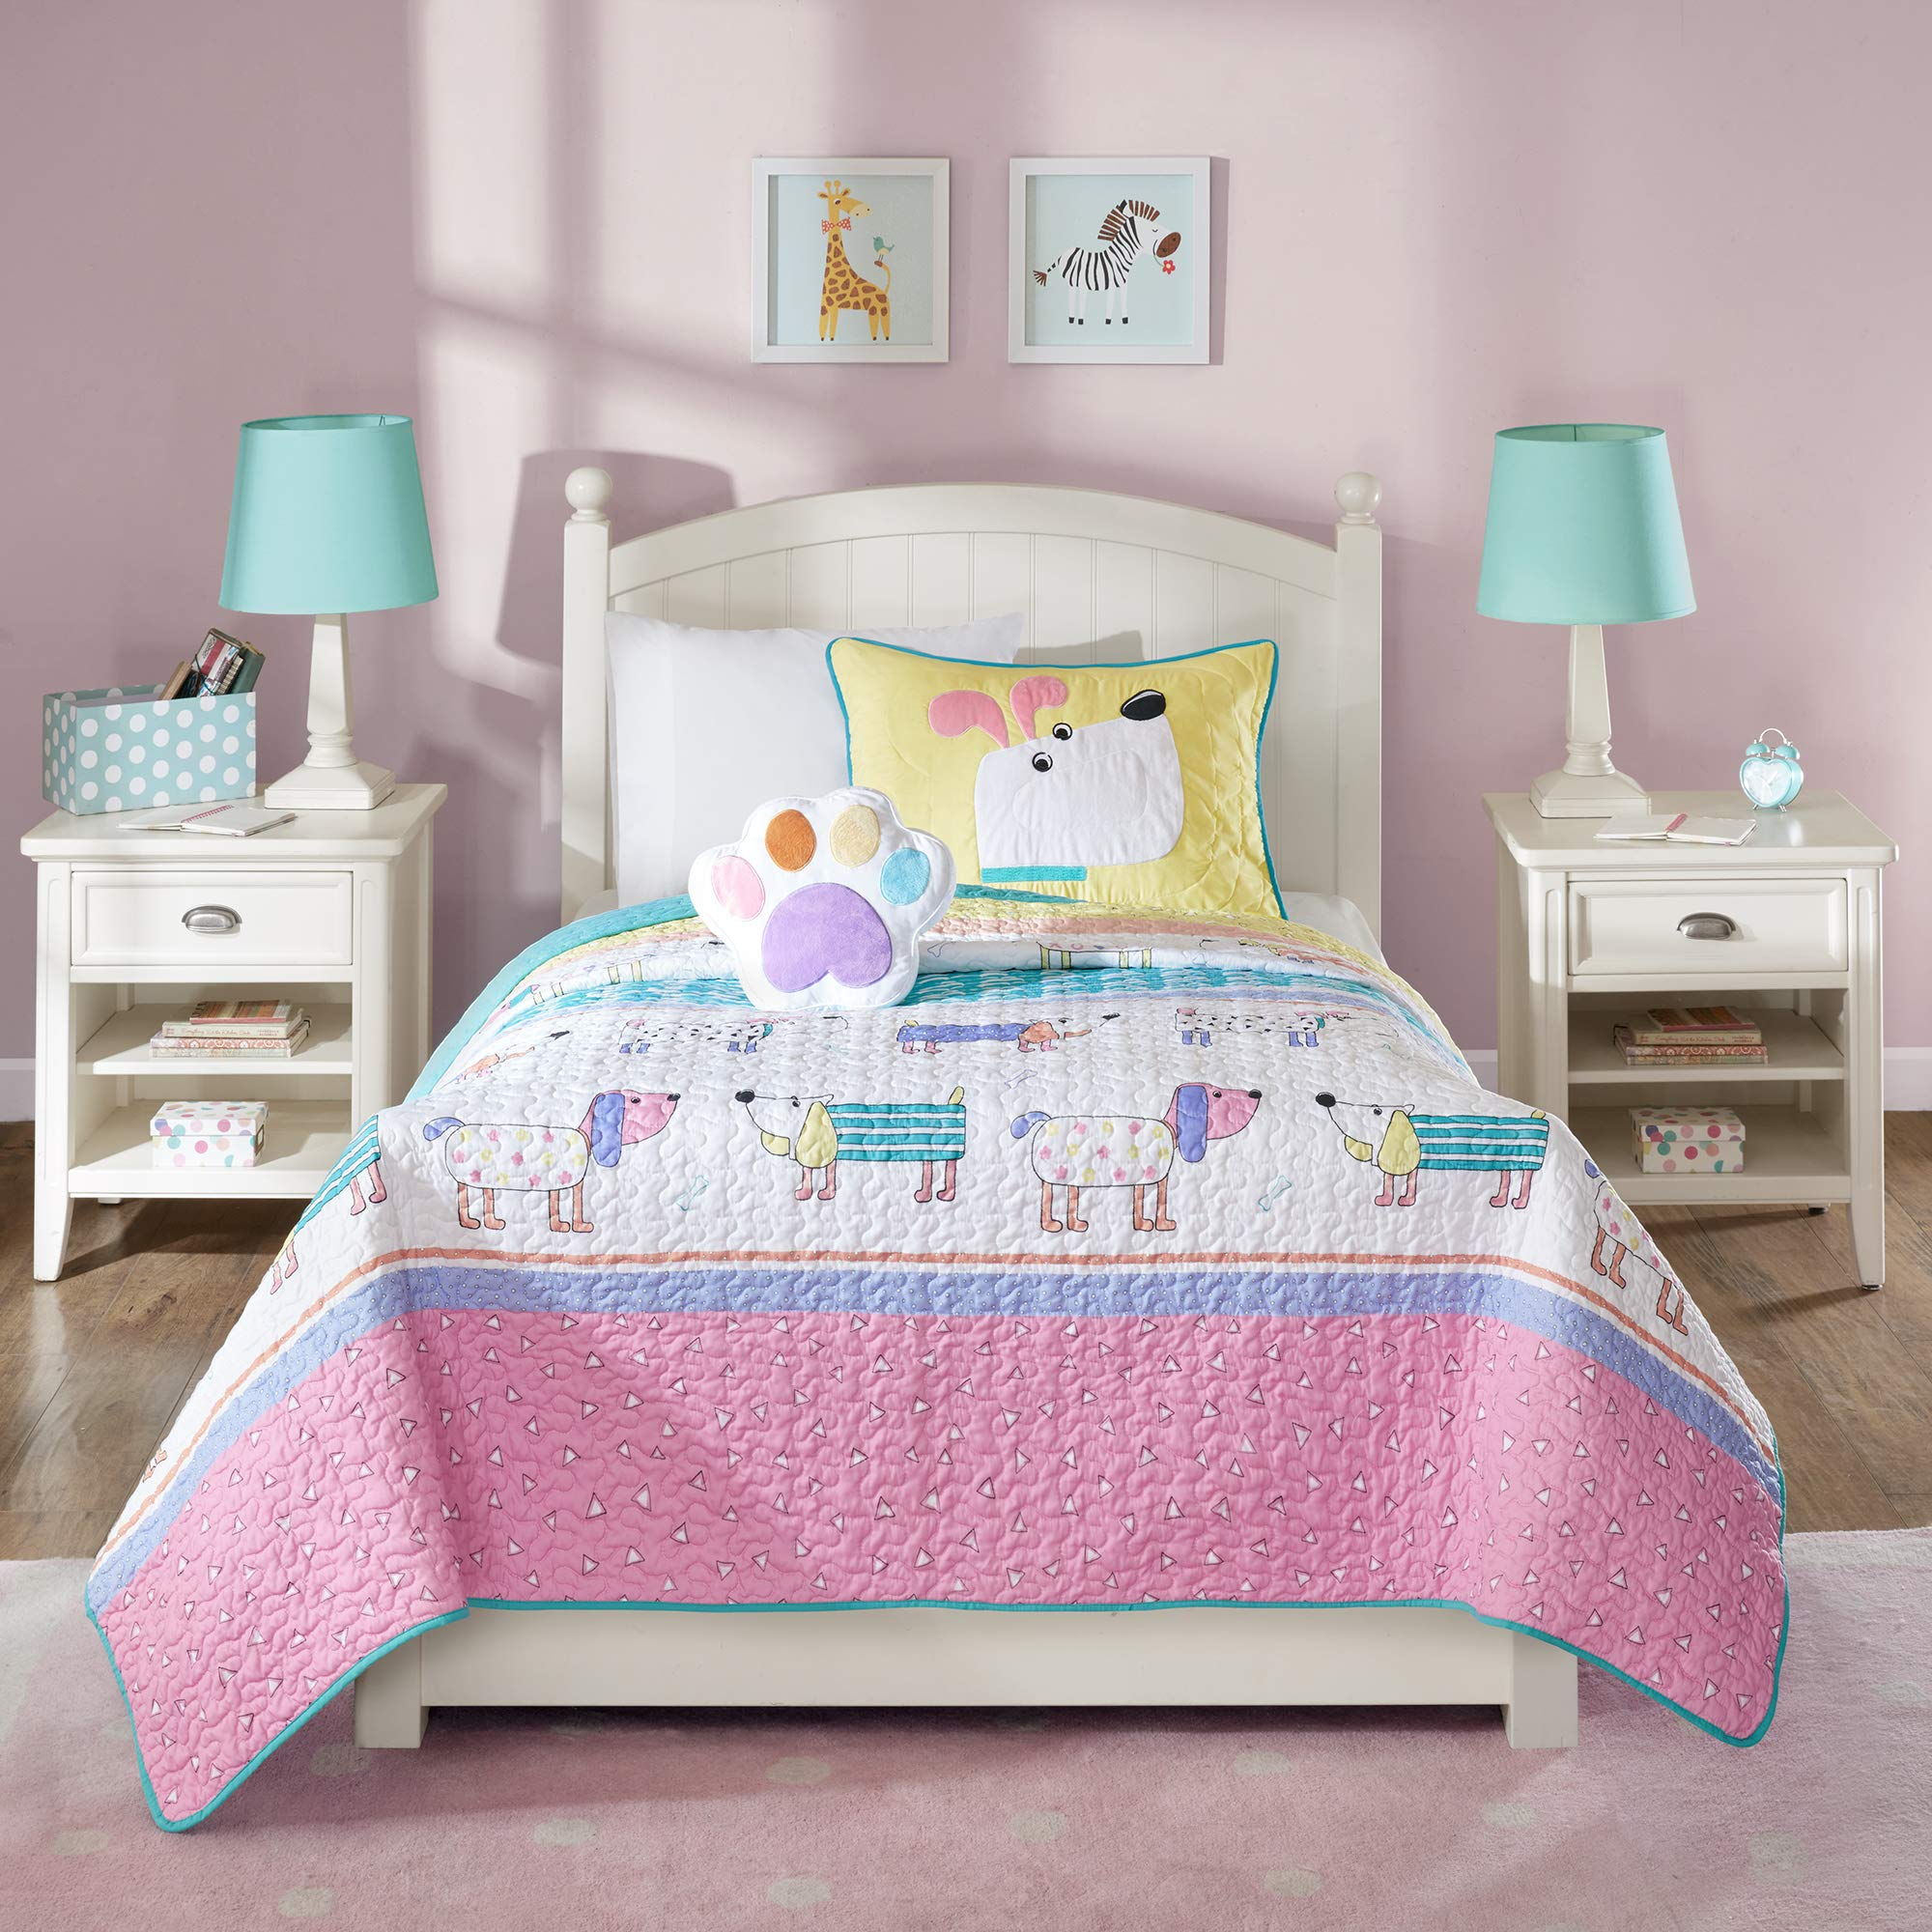 Mi Zone Kids Milo Twin Bedding for Girls Quilt Set - Pink Yellow, Animal Dog - 3 Piece Kids Girls Quilts - Ultra Soft Microfiber Quilt Sets Coverlet by Mizone Kids